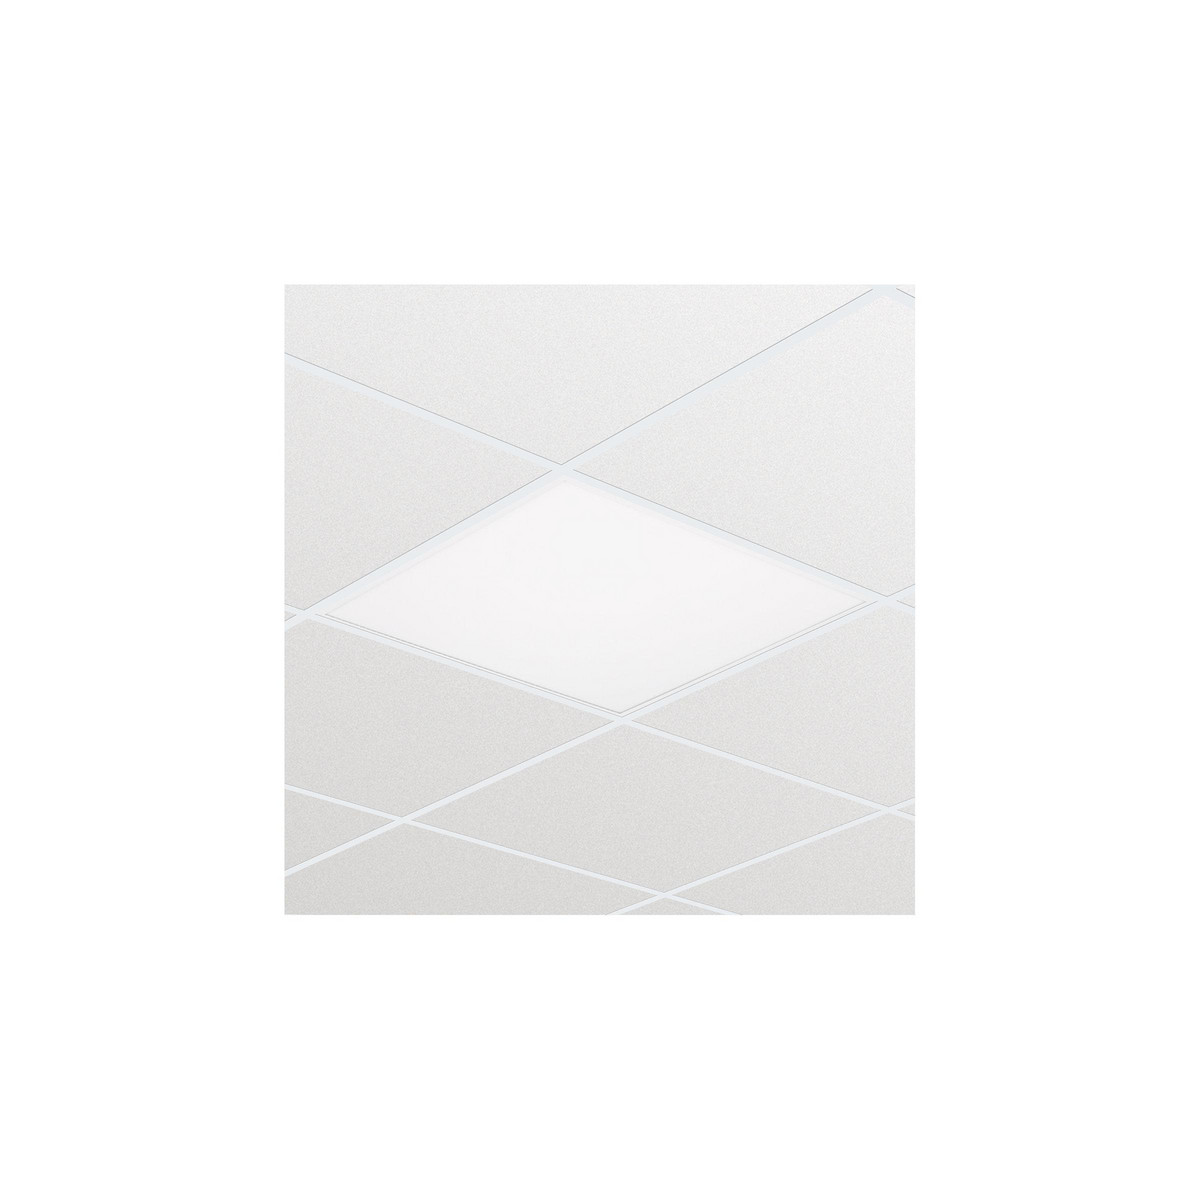 Philips Ledinaire Panel RC065B Gen2 60x60 3400lm/840 38W